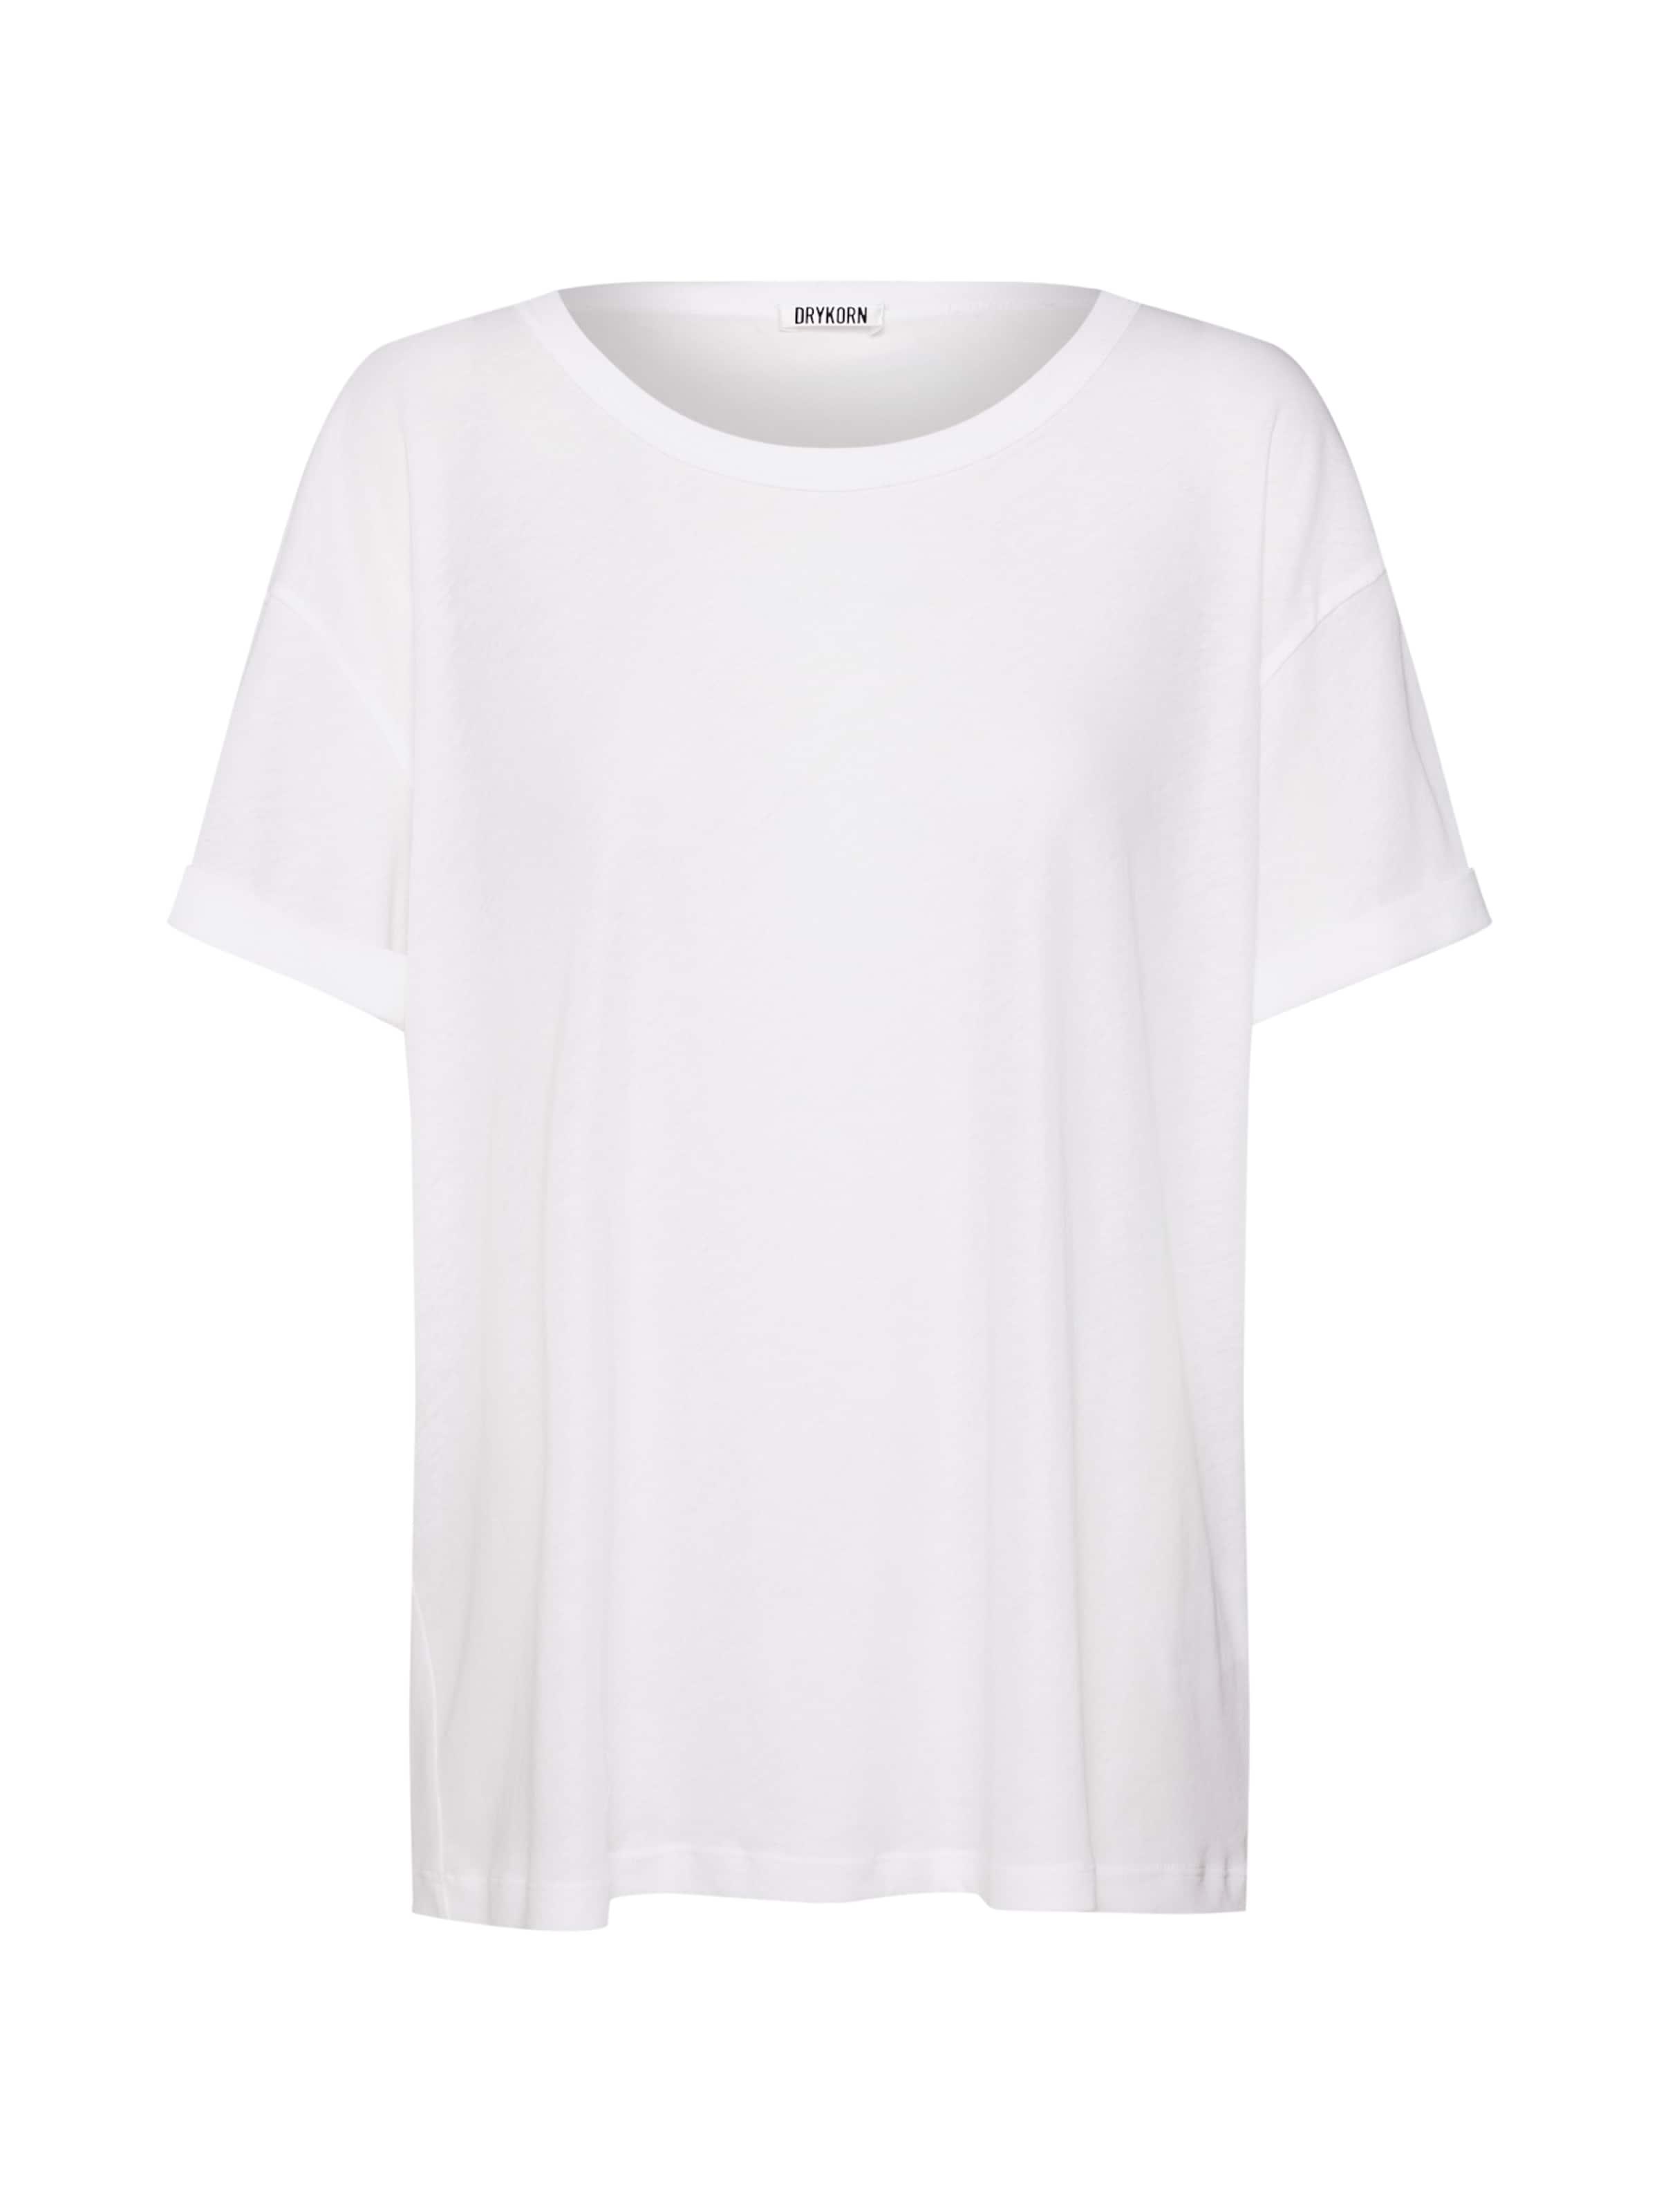 'larima' En Blanc shirt Drykorn T Oversize 54LcAR3jq